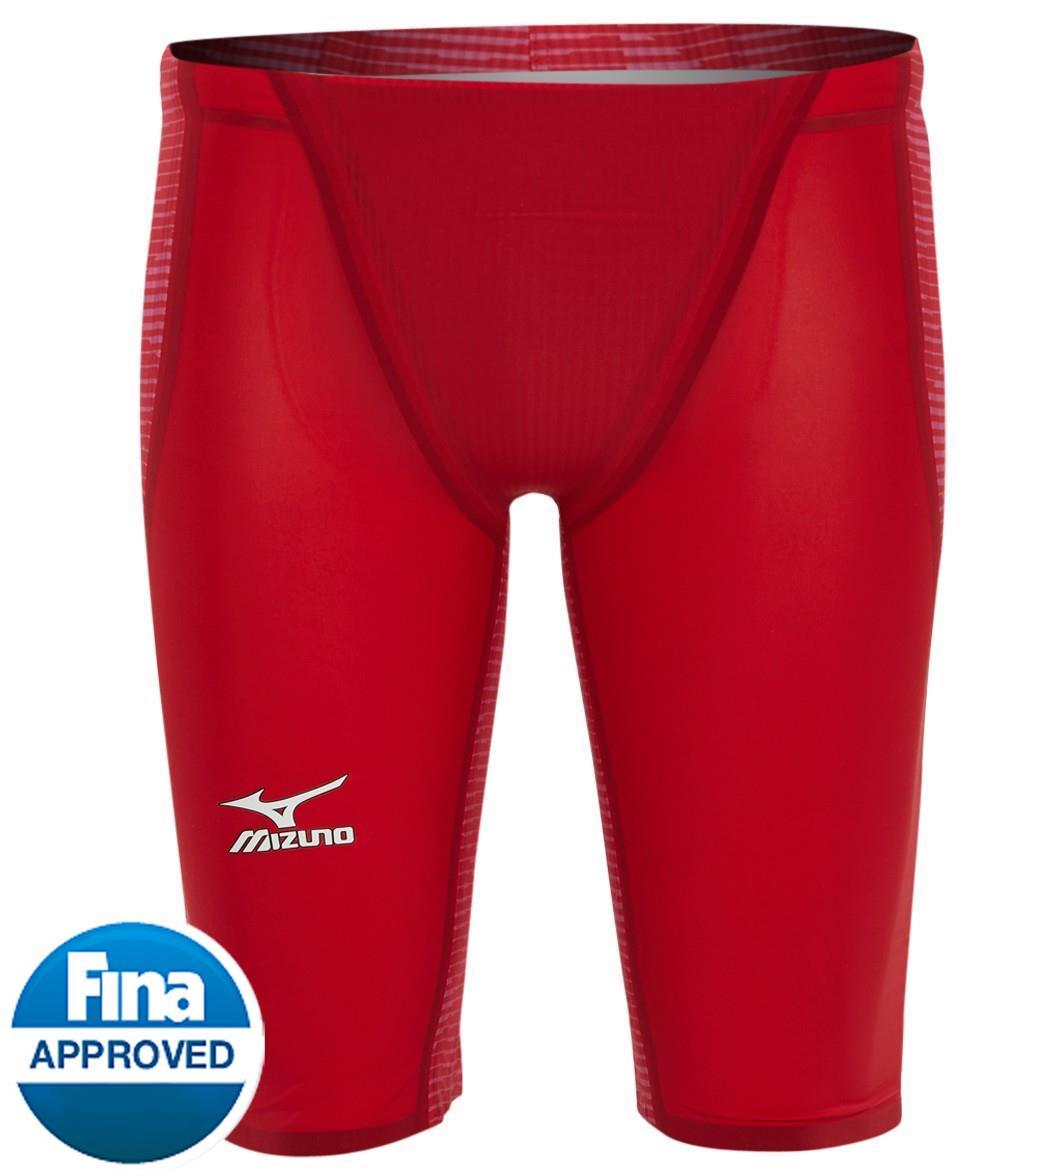 f025c175cd Mizuno Men's GX-Sonic III ST Elite Jammer Swimsuit at SwimOutlet.com ...